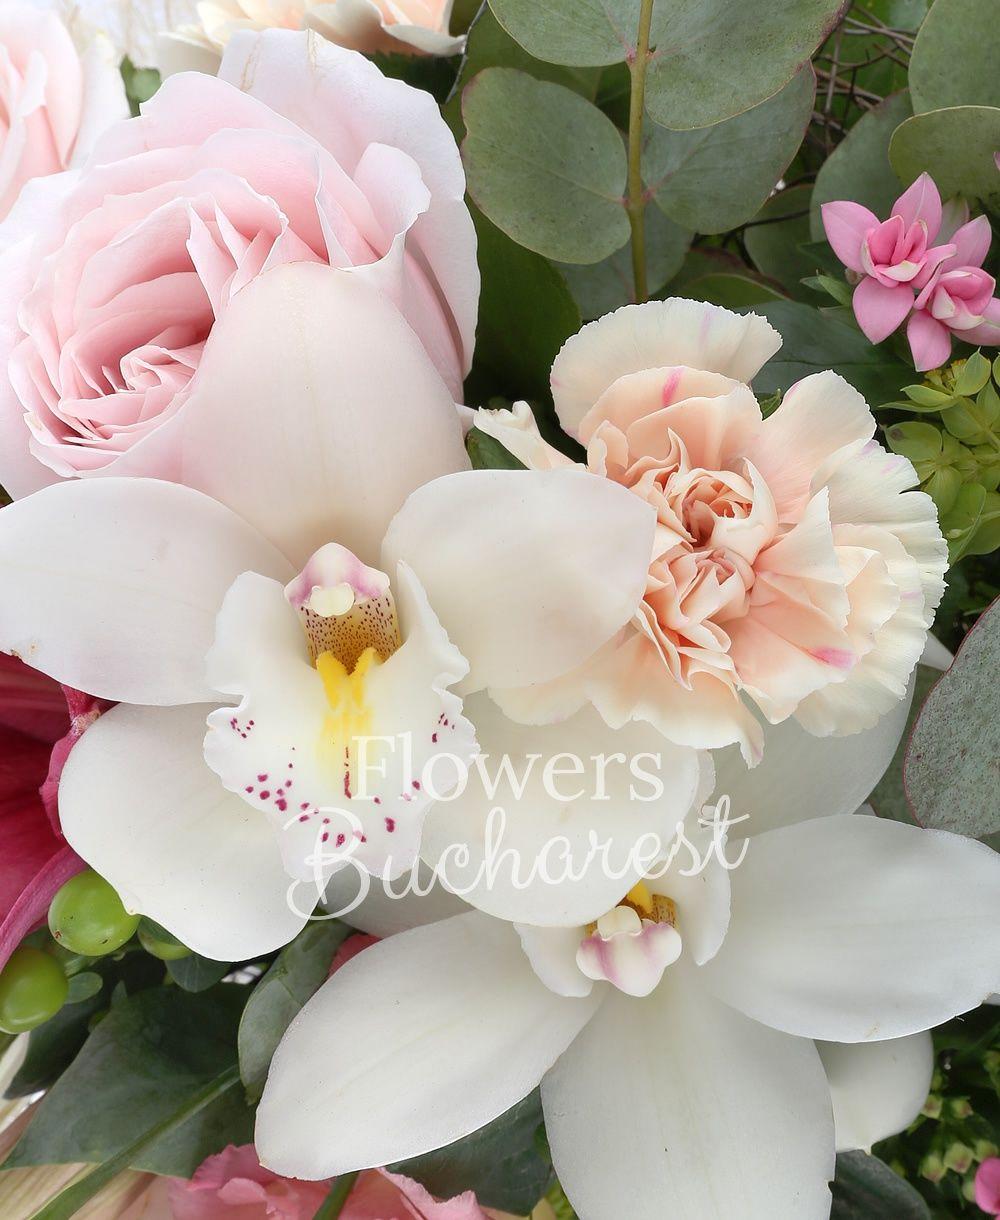 1 pink lily, 5 cream carnations, 5 green hypericum, 3 pink bouvardia, 3 pink roses, 3 pink lisianthus, cymbidium, bupleurum, greenery